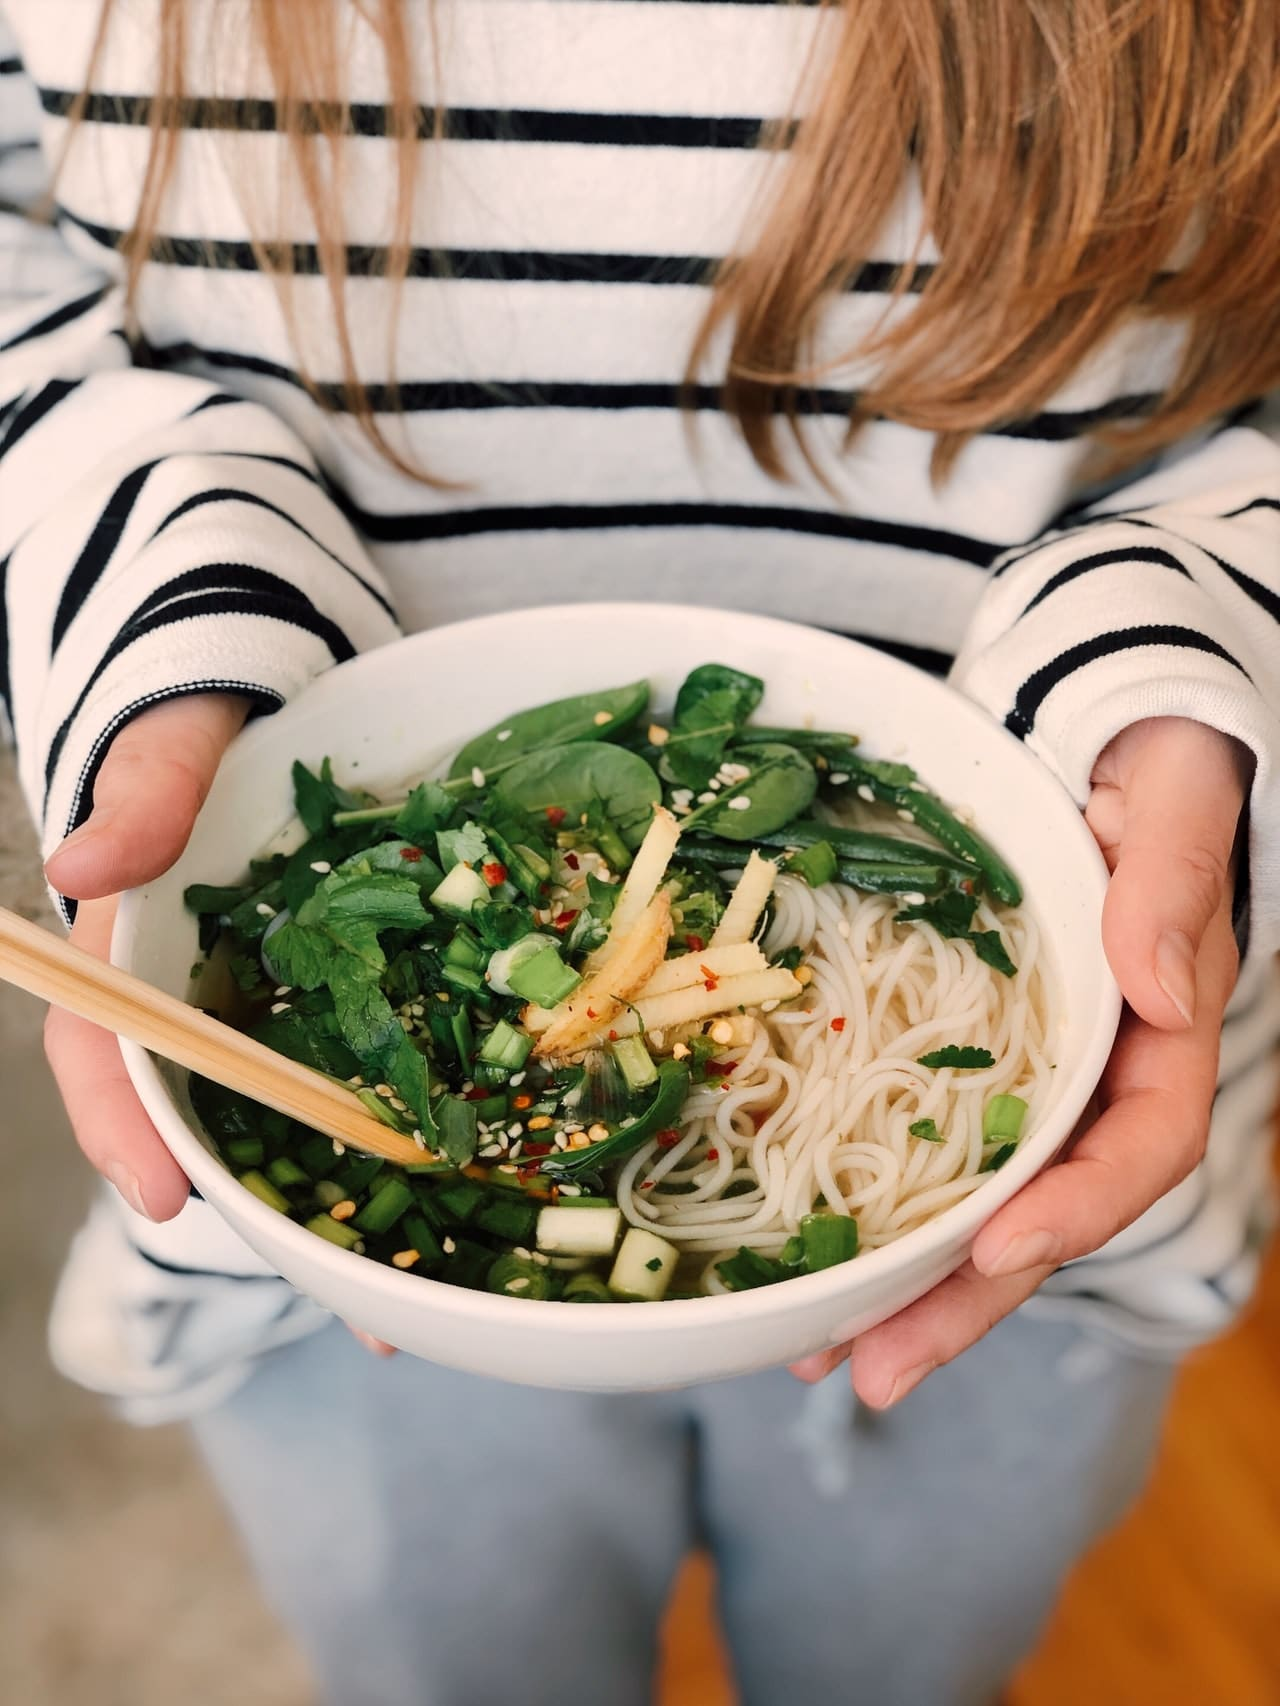 bestme instant noodles